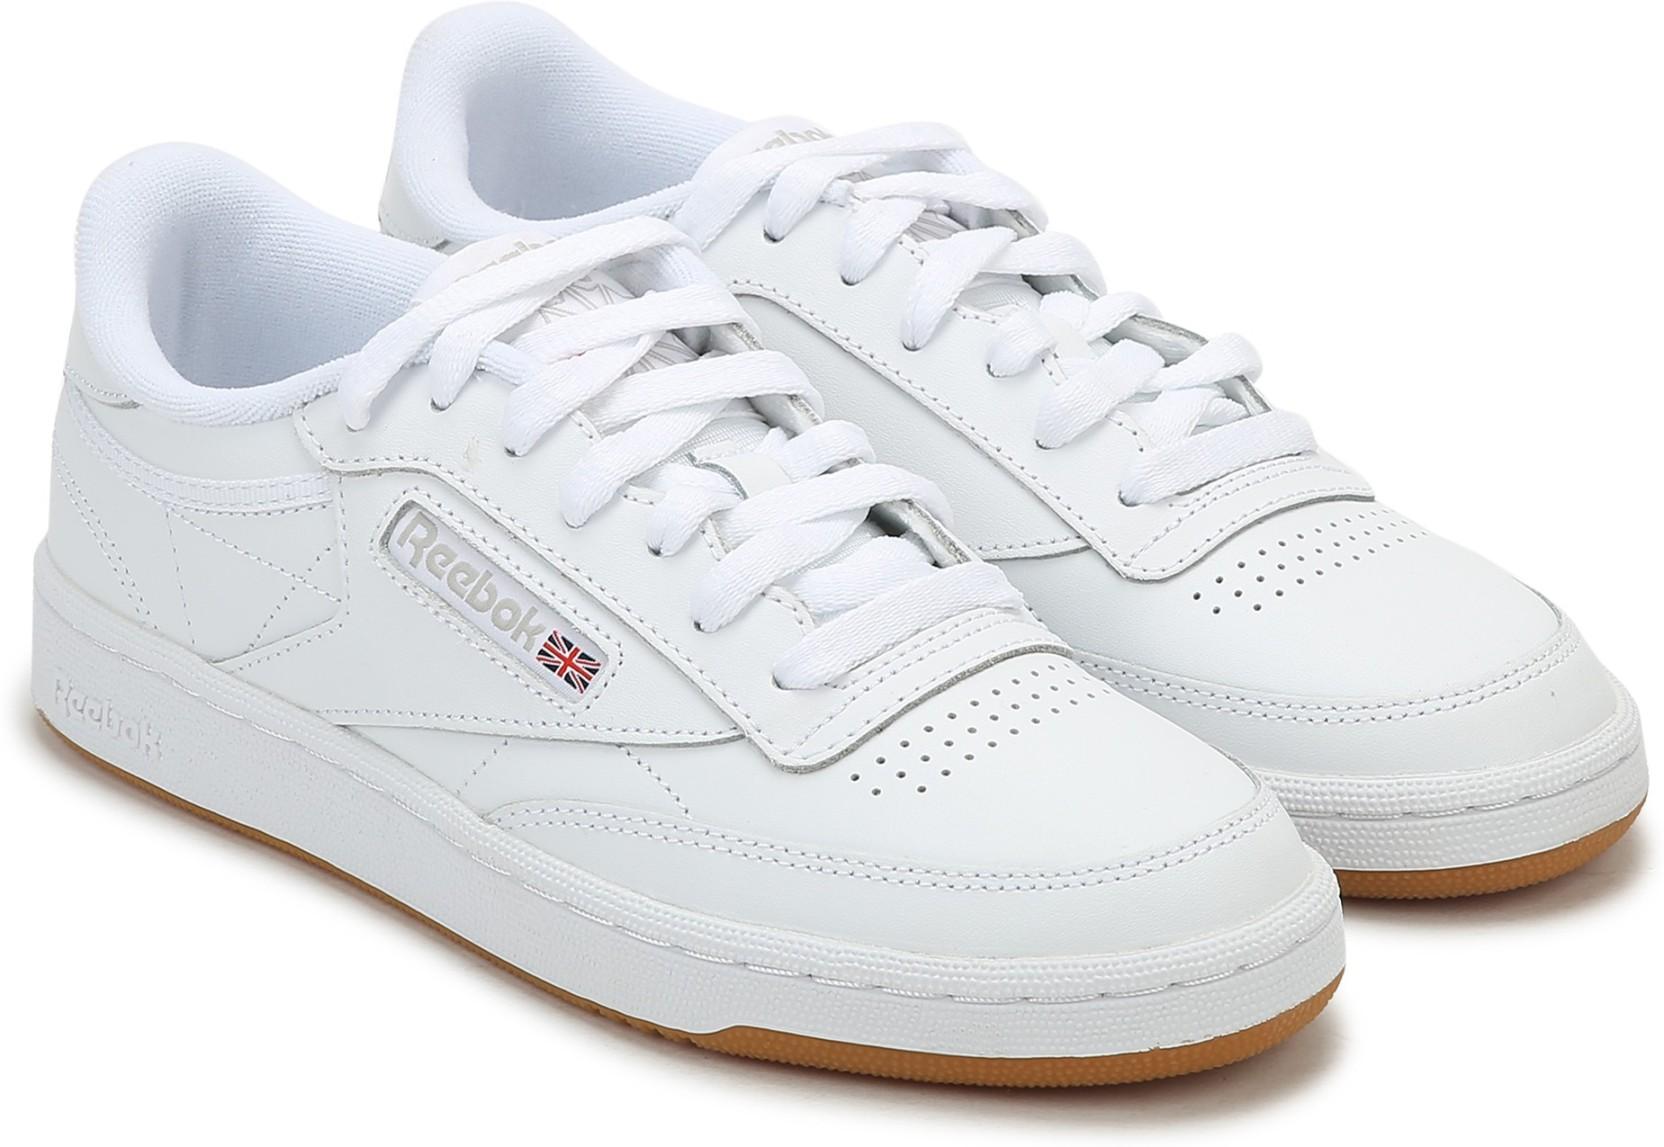 c0bca44b58c9 REEBOK CLASSICS CLUB C 85 Sneakers For Women - Buy WHITE LIGHT GREY ...